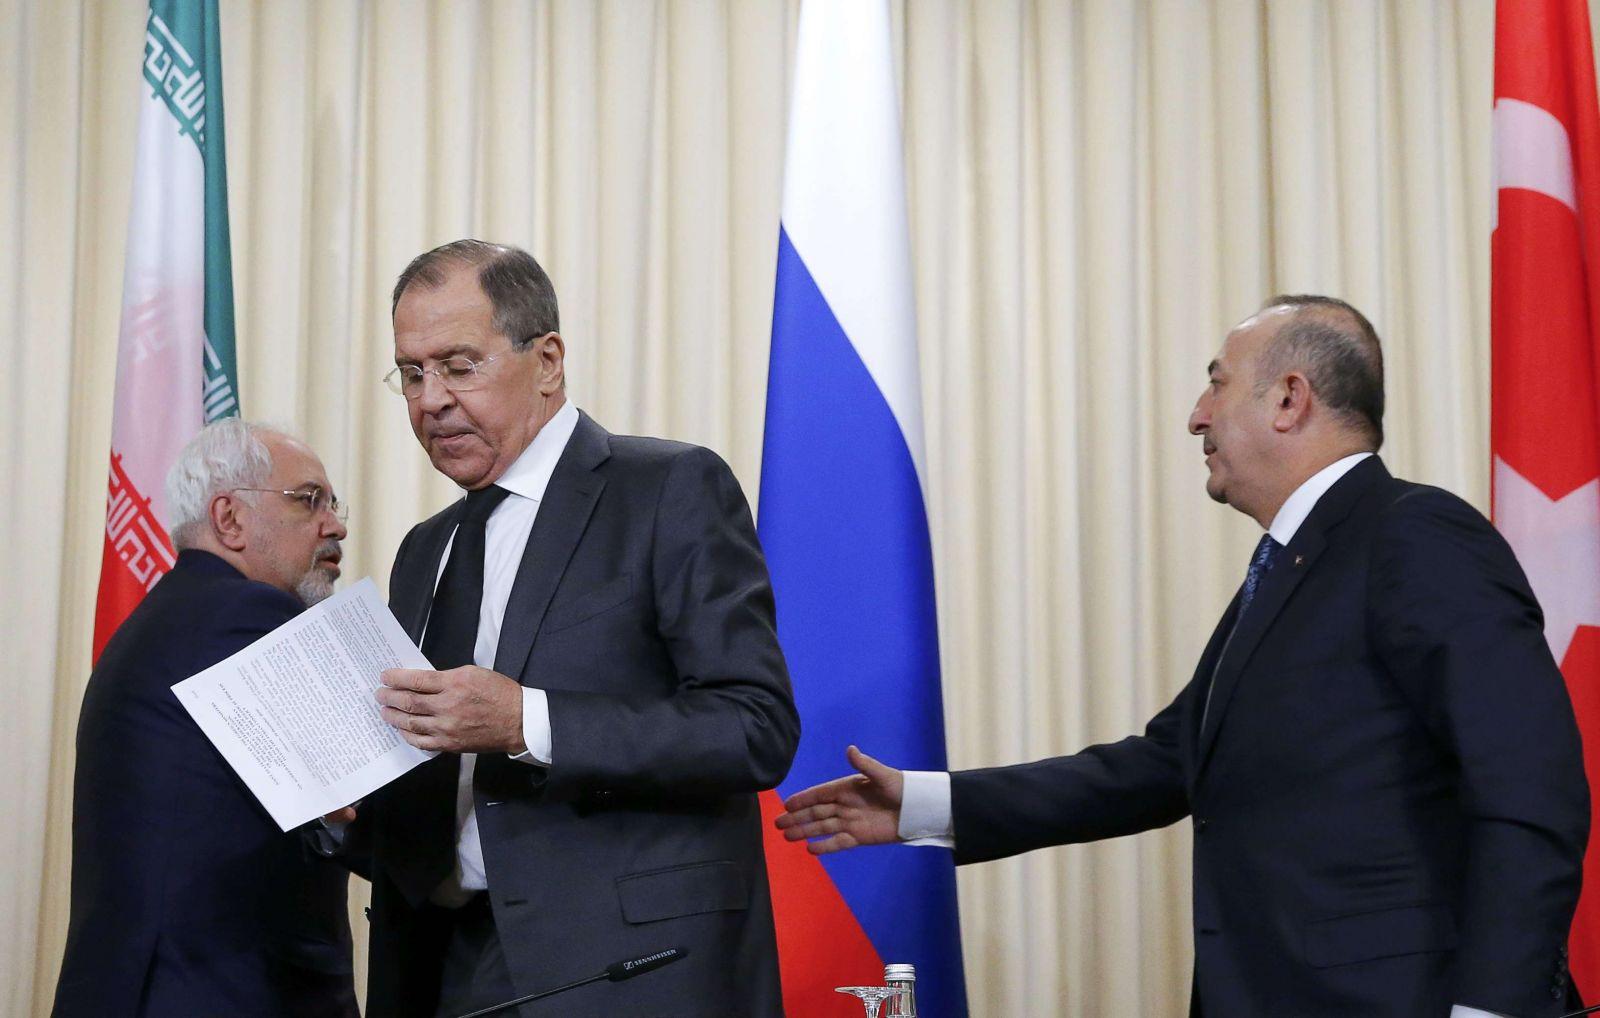 Photo of مصدر روسي: سيتم الدعوة إلى مفاوضات أستانا عبر إعلان روسي تركي إيراني مشترك فقط